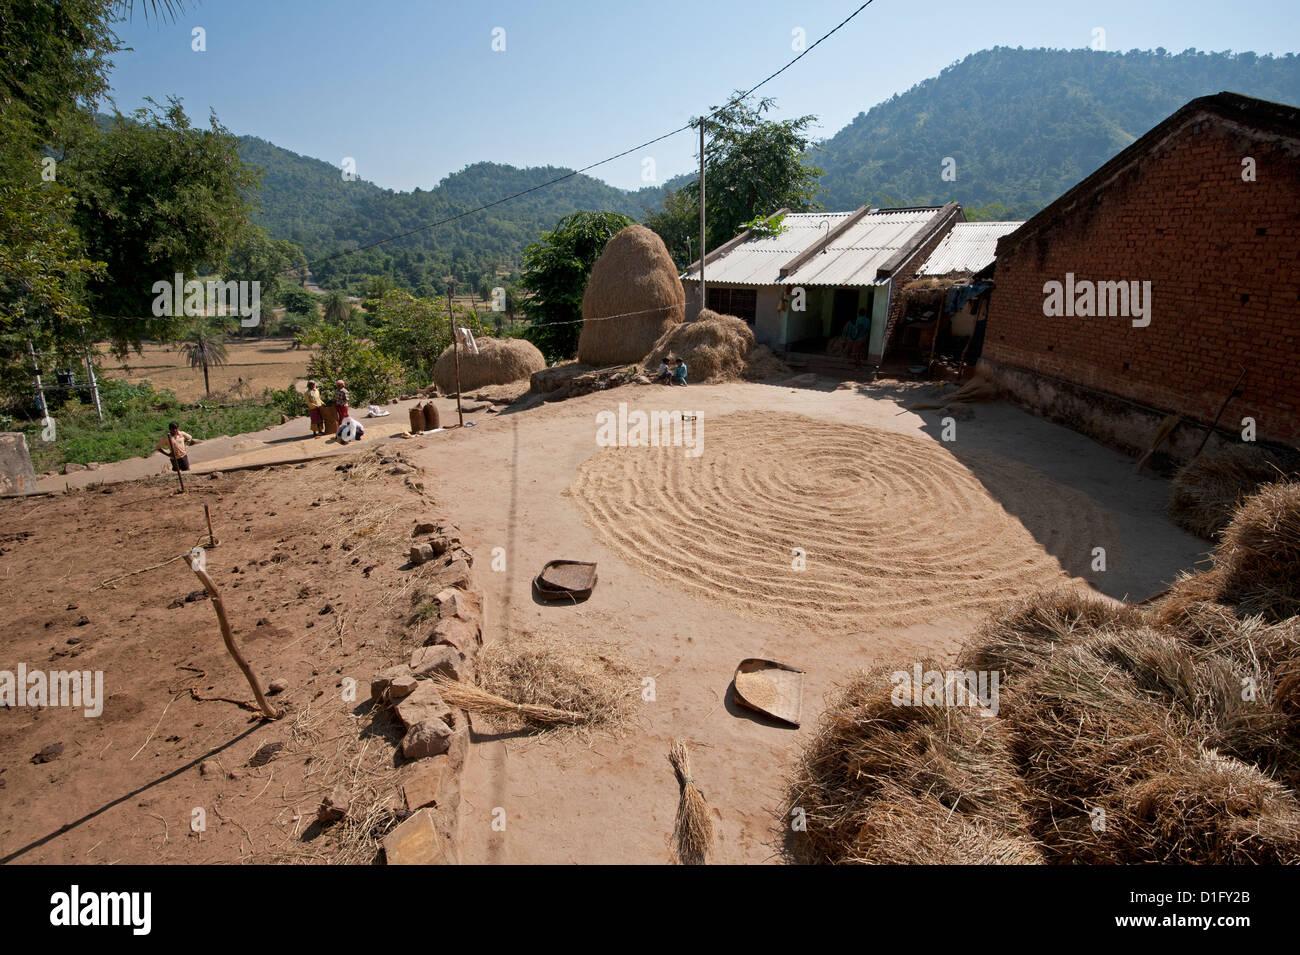 Saura village in rural Orissa, hand winnowed rice drying in the central area, Orissan style haystacks behind, Orissa, - Stock Image